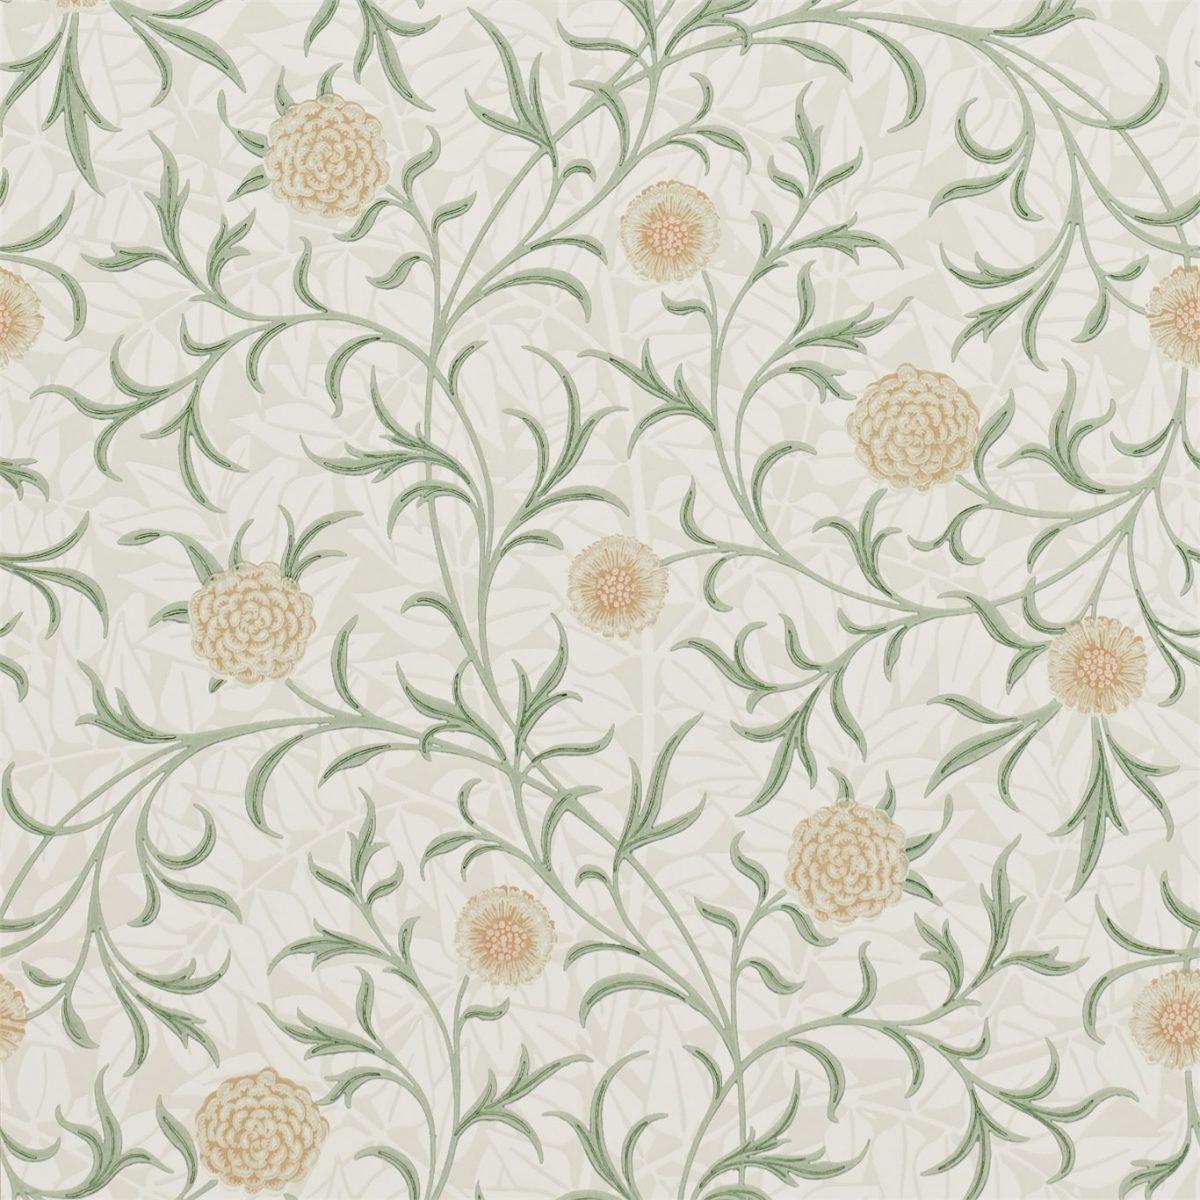 Morris & Co Tapet Scroll Pear